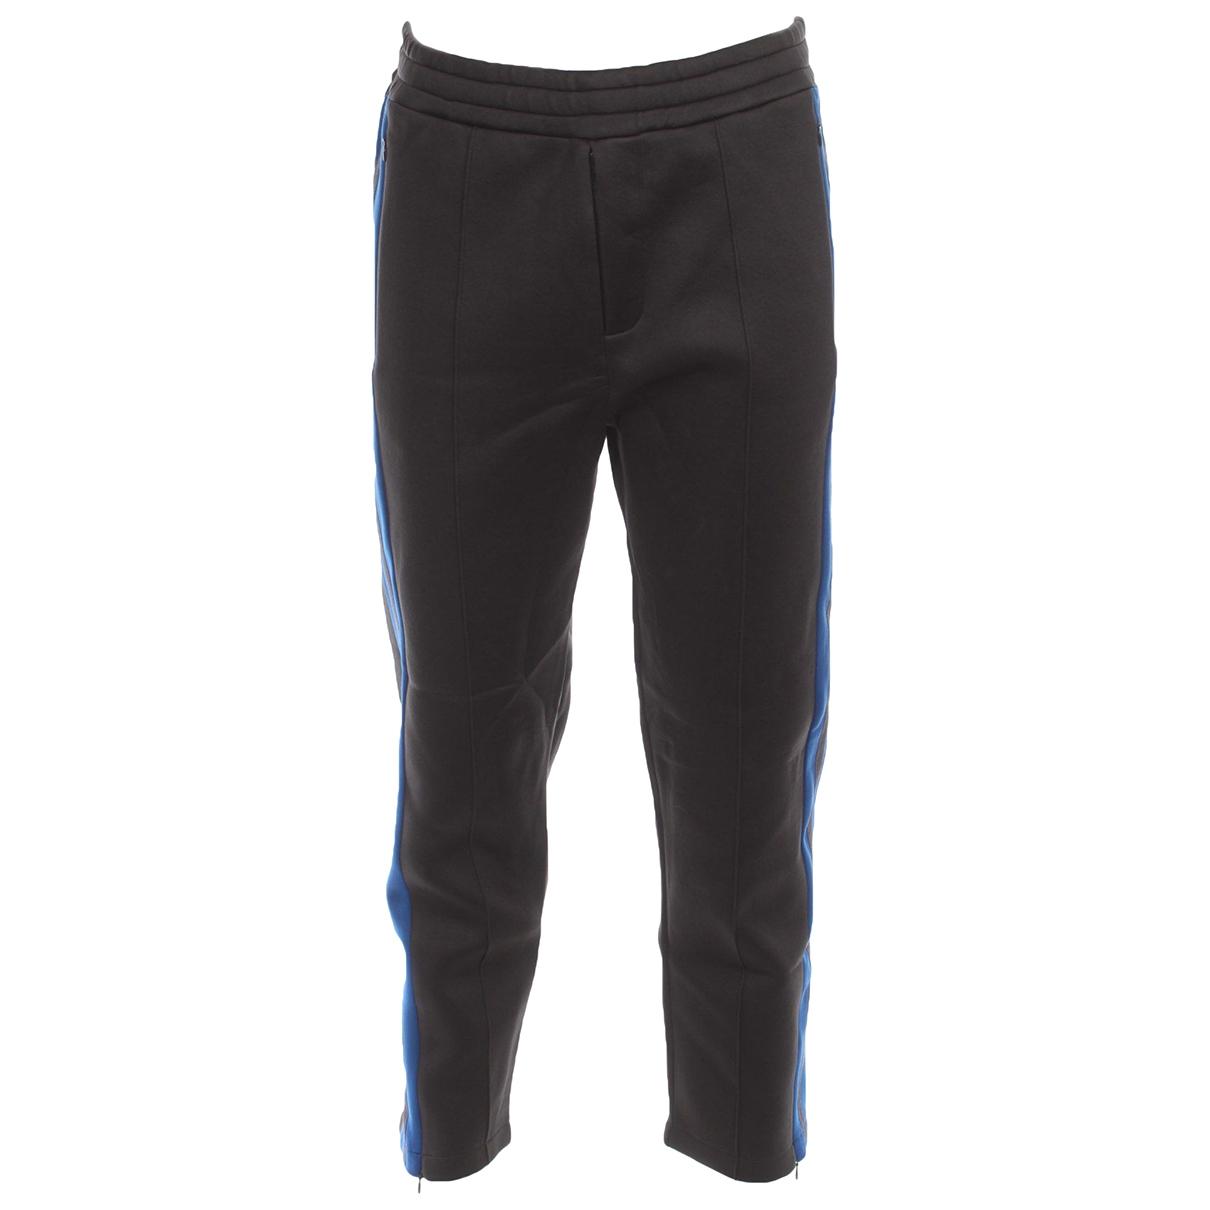 Joseph \N Grey Trousers for Men M International